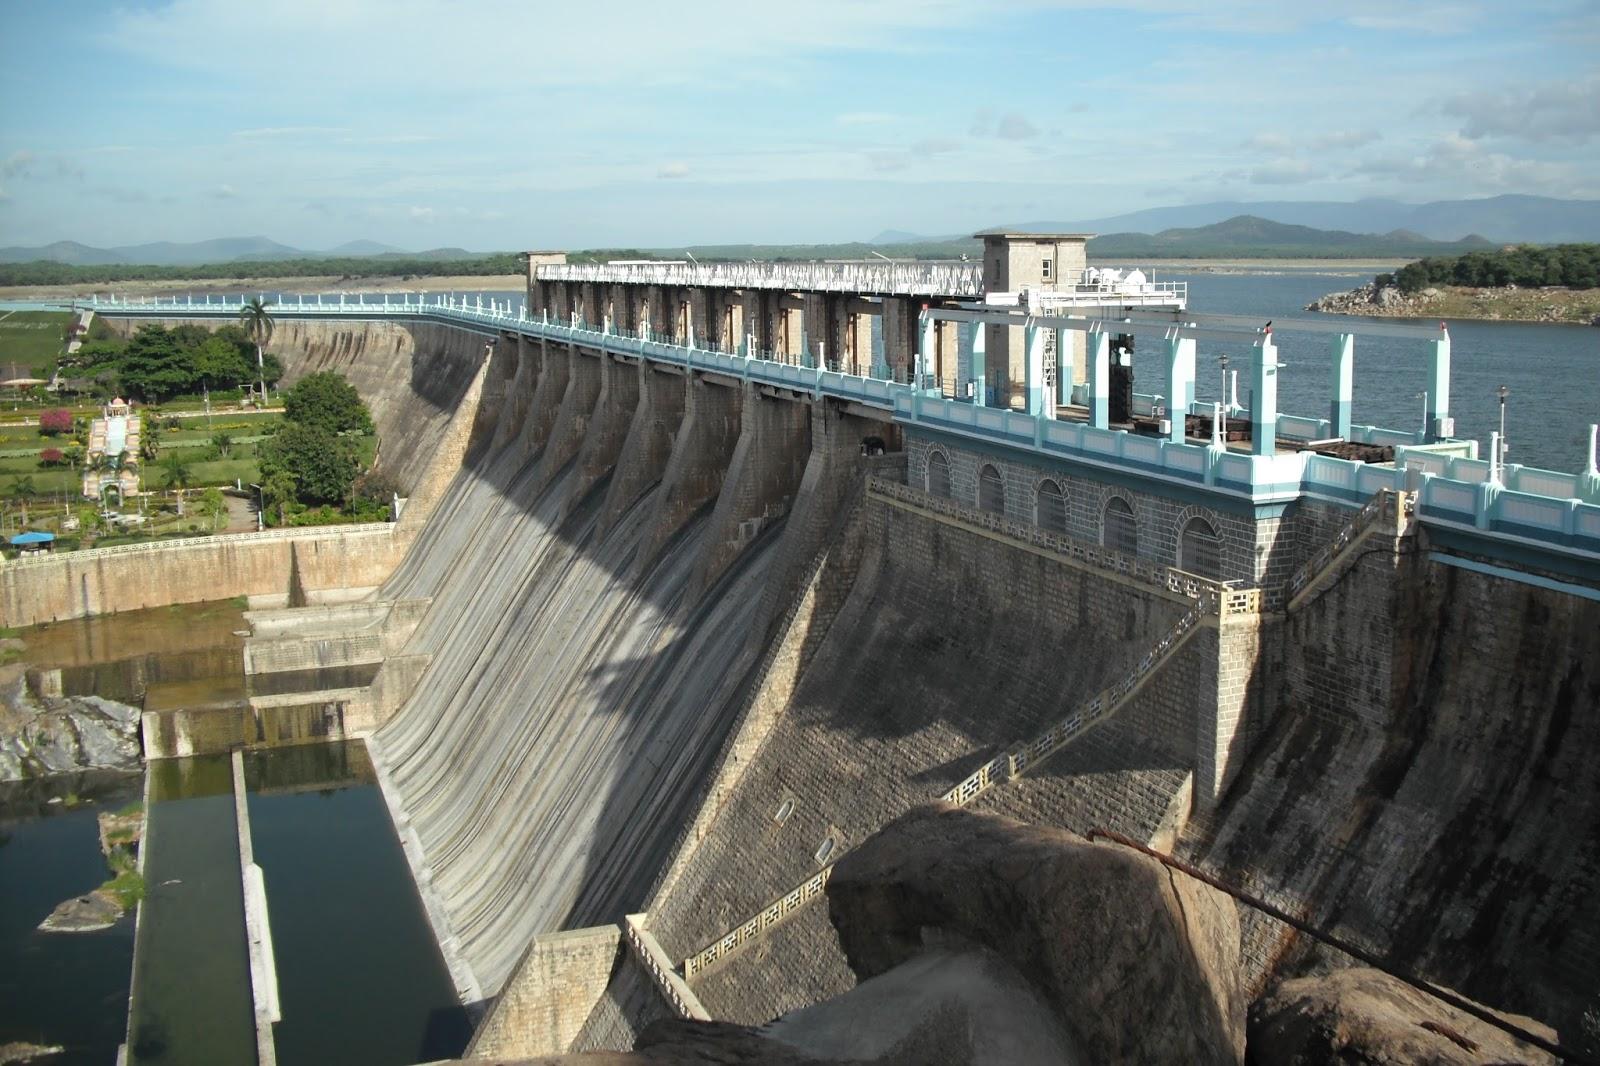 Tamilnadu Tourism: Sathanur Dam, Thiruvannamalai